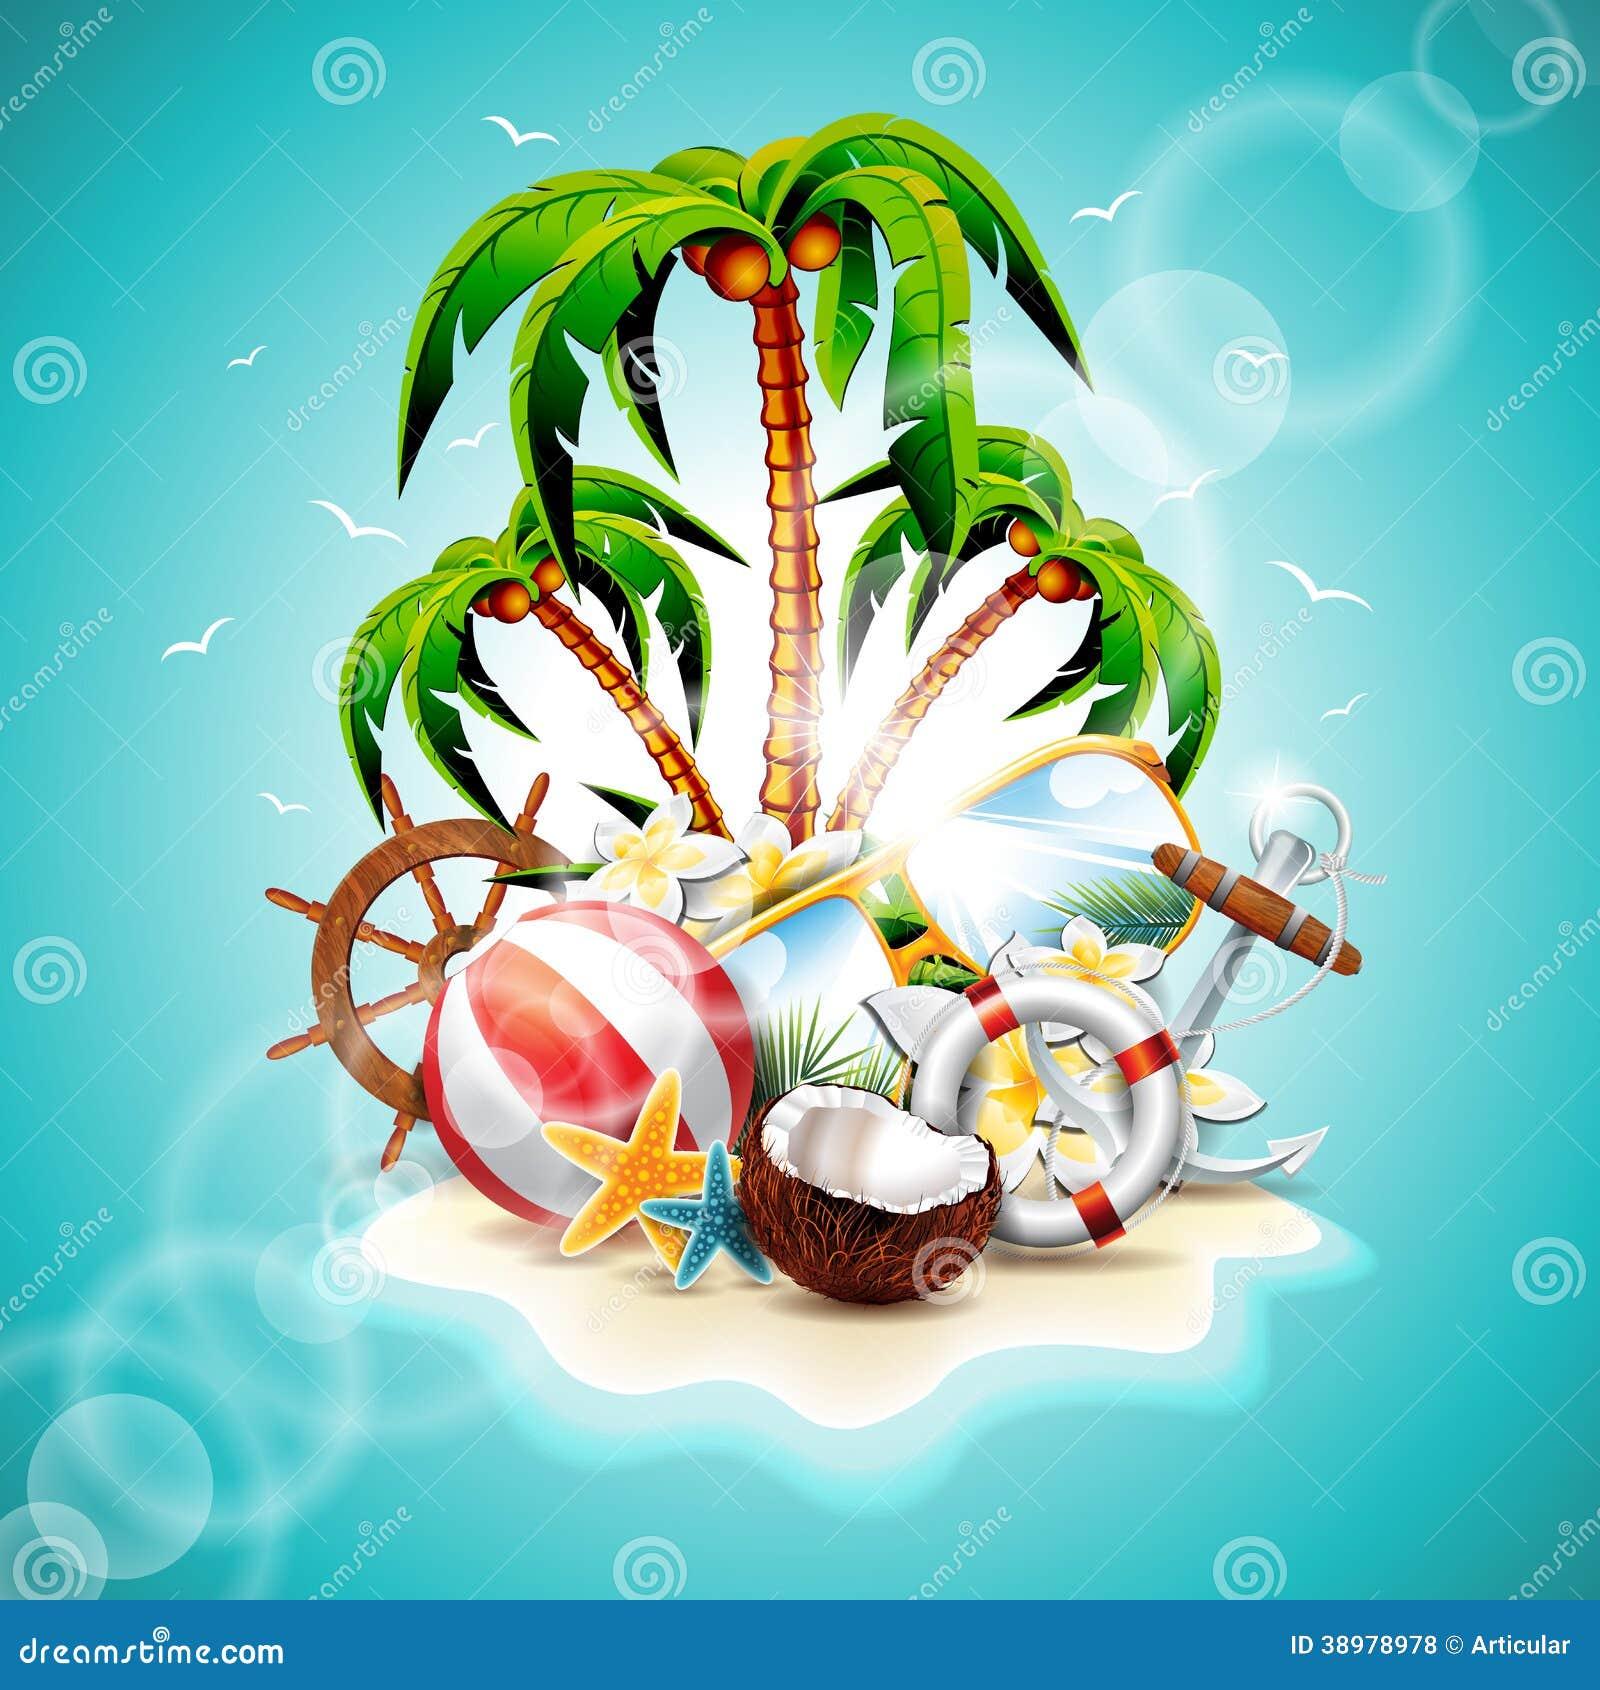 Island Christmas Theme.Vector Illustration On A Summer Holiday Theme Stock Vector